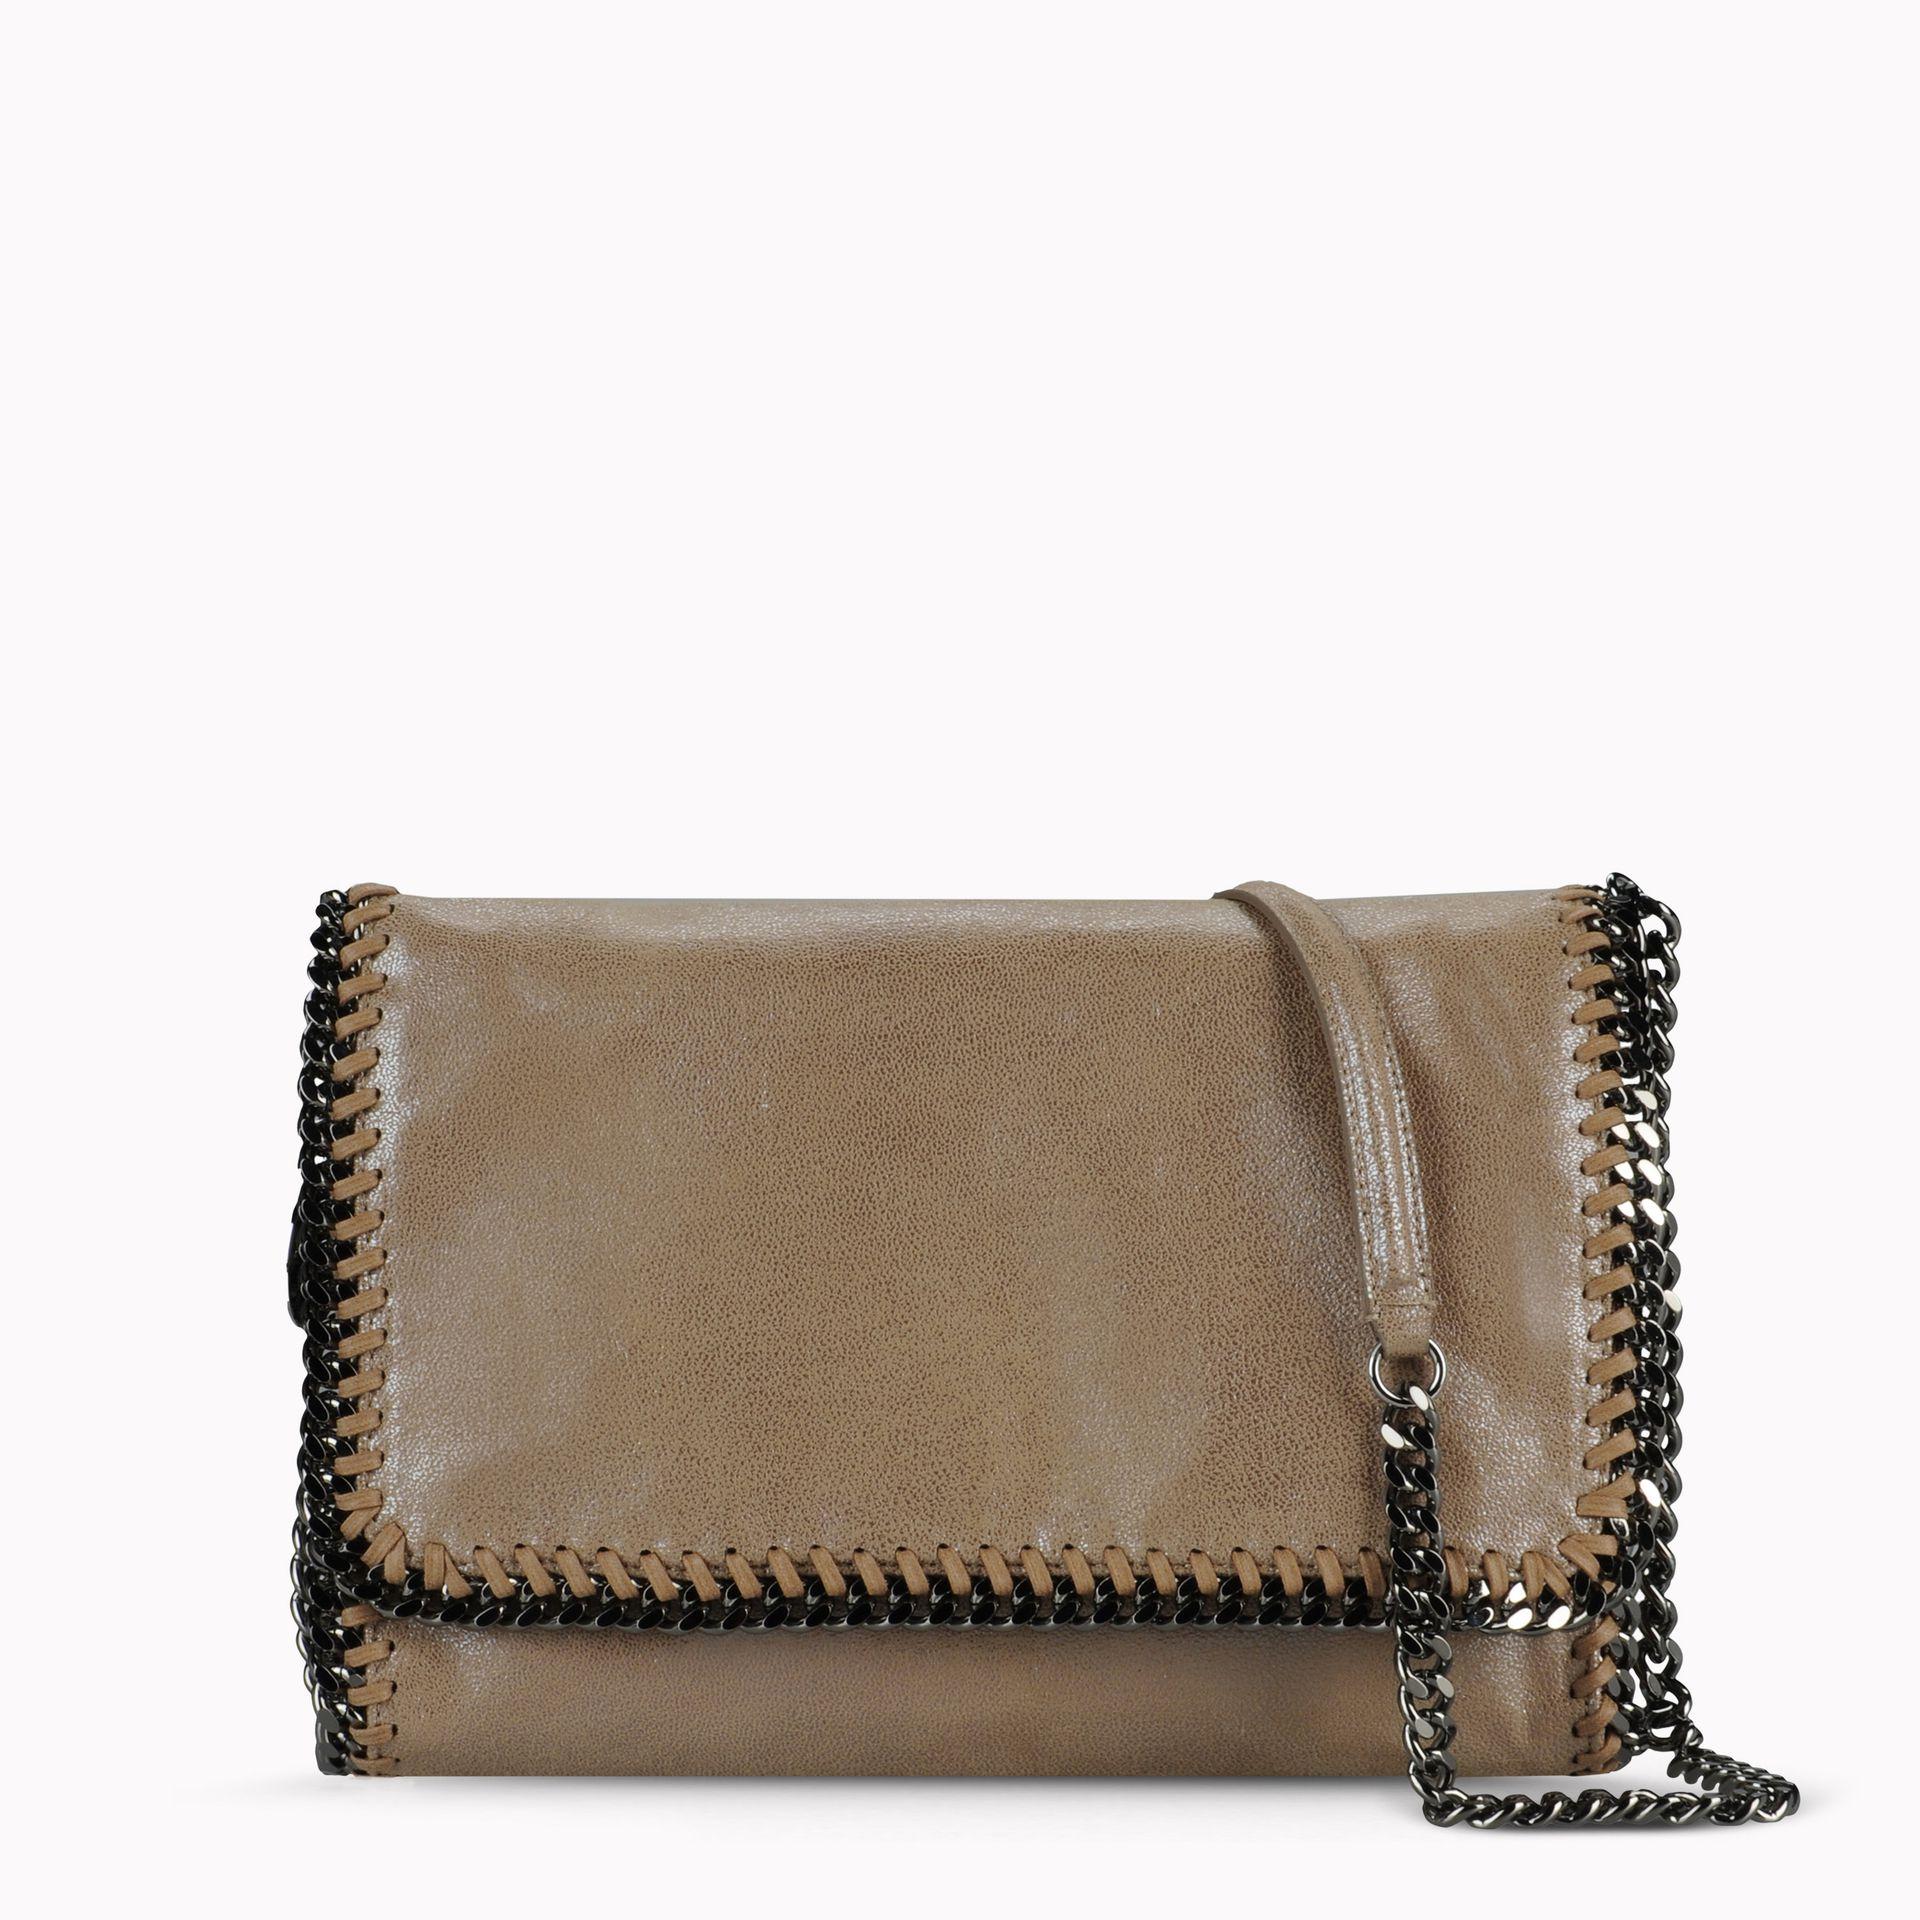 950cad1367 Lyst - Stella McCartney Falabella Chamois Cross Body Bag in Natural